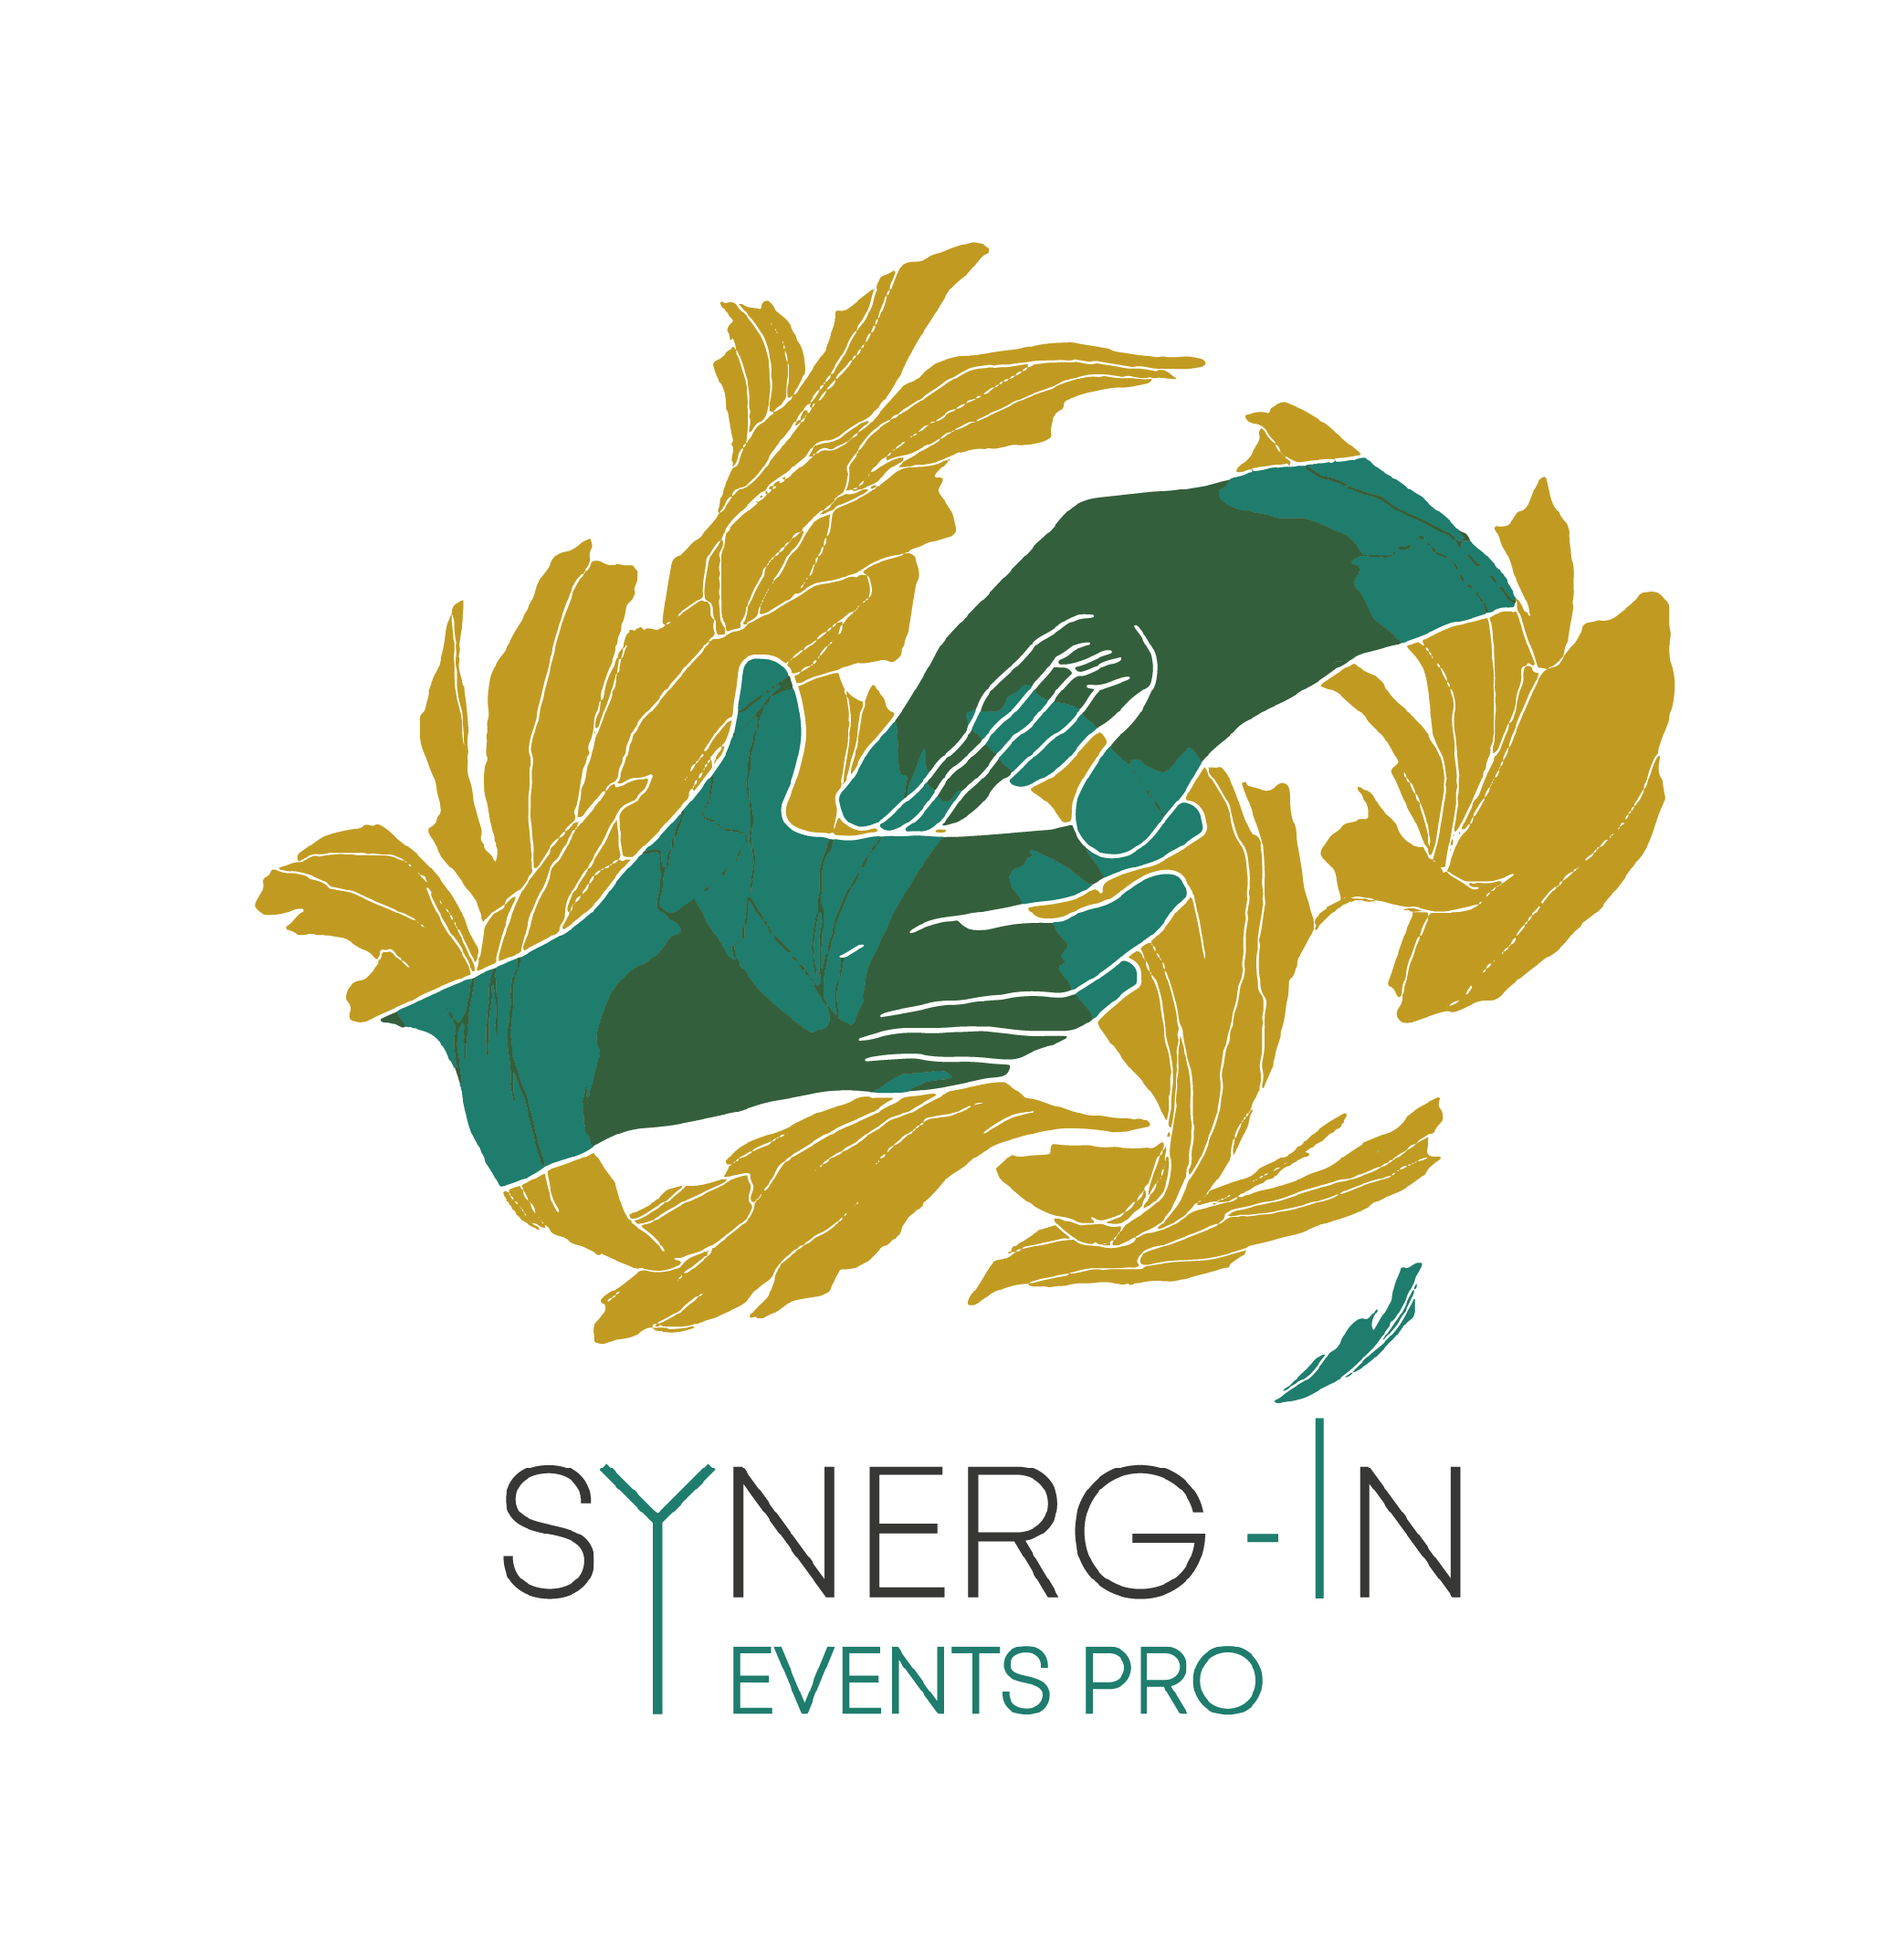 Logo Pole Event Pro